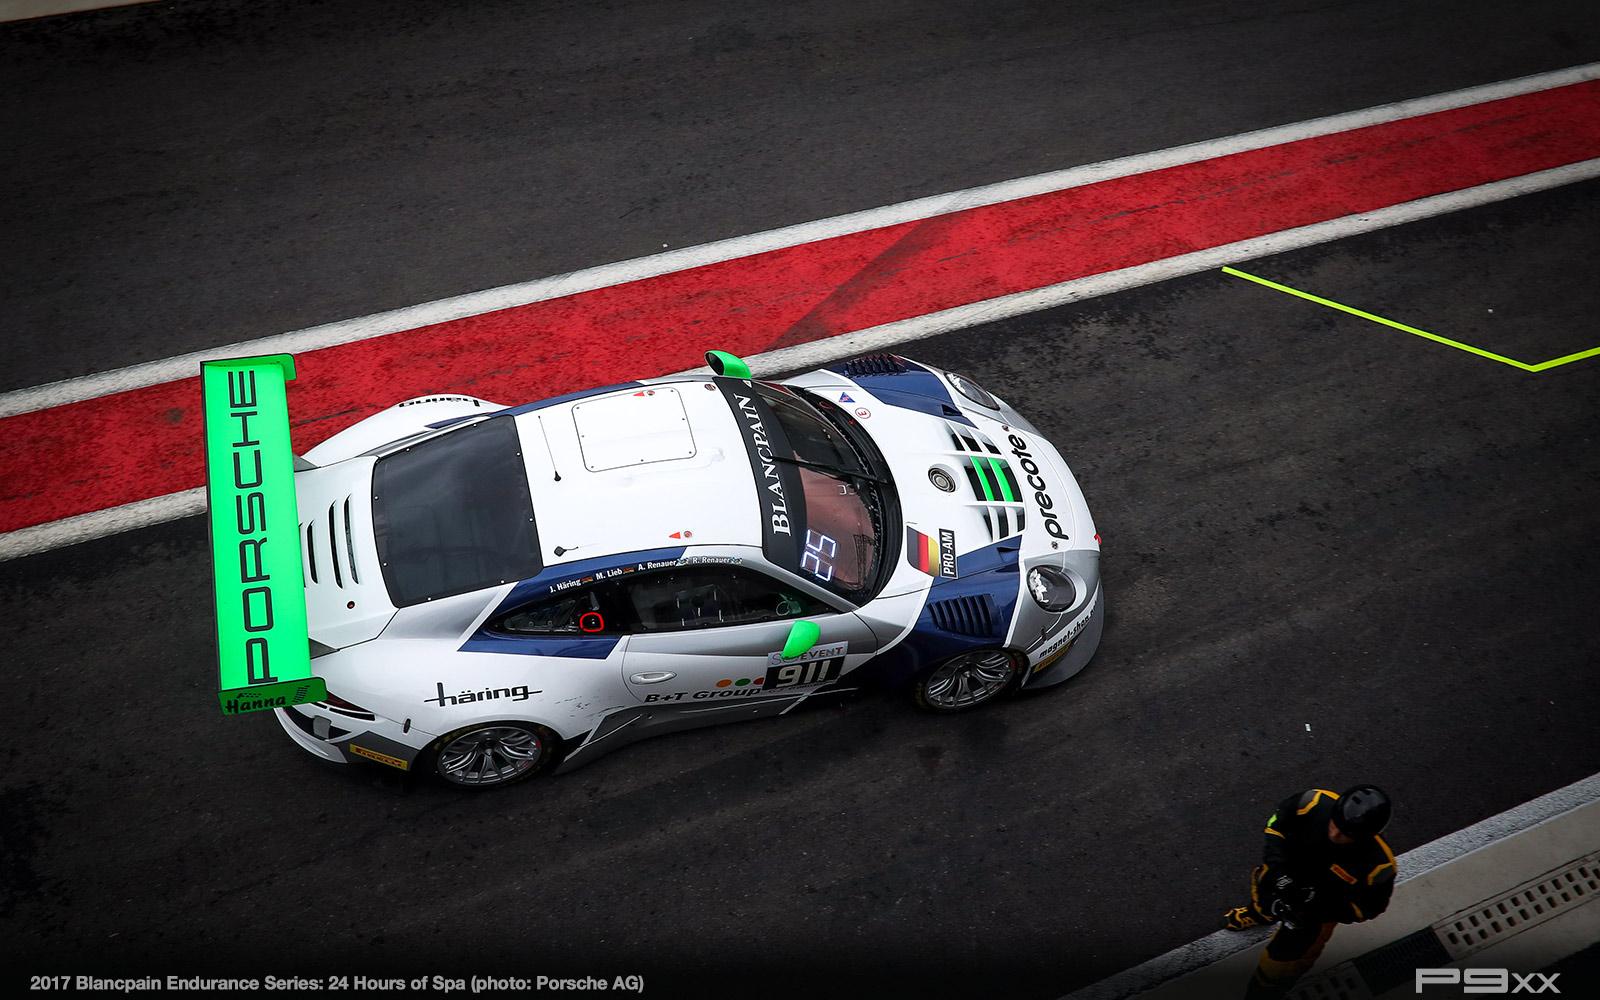 2017-24-Hours-of-Spa-Porsche-372